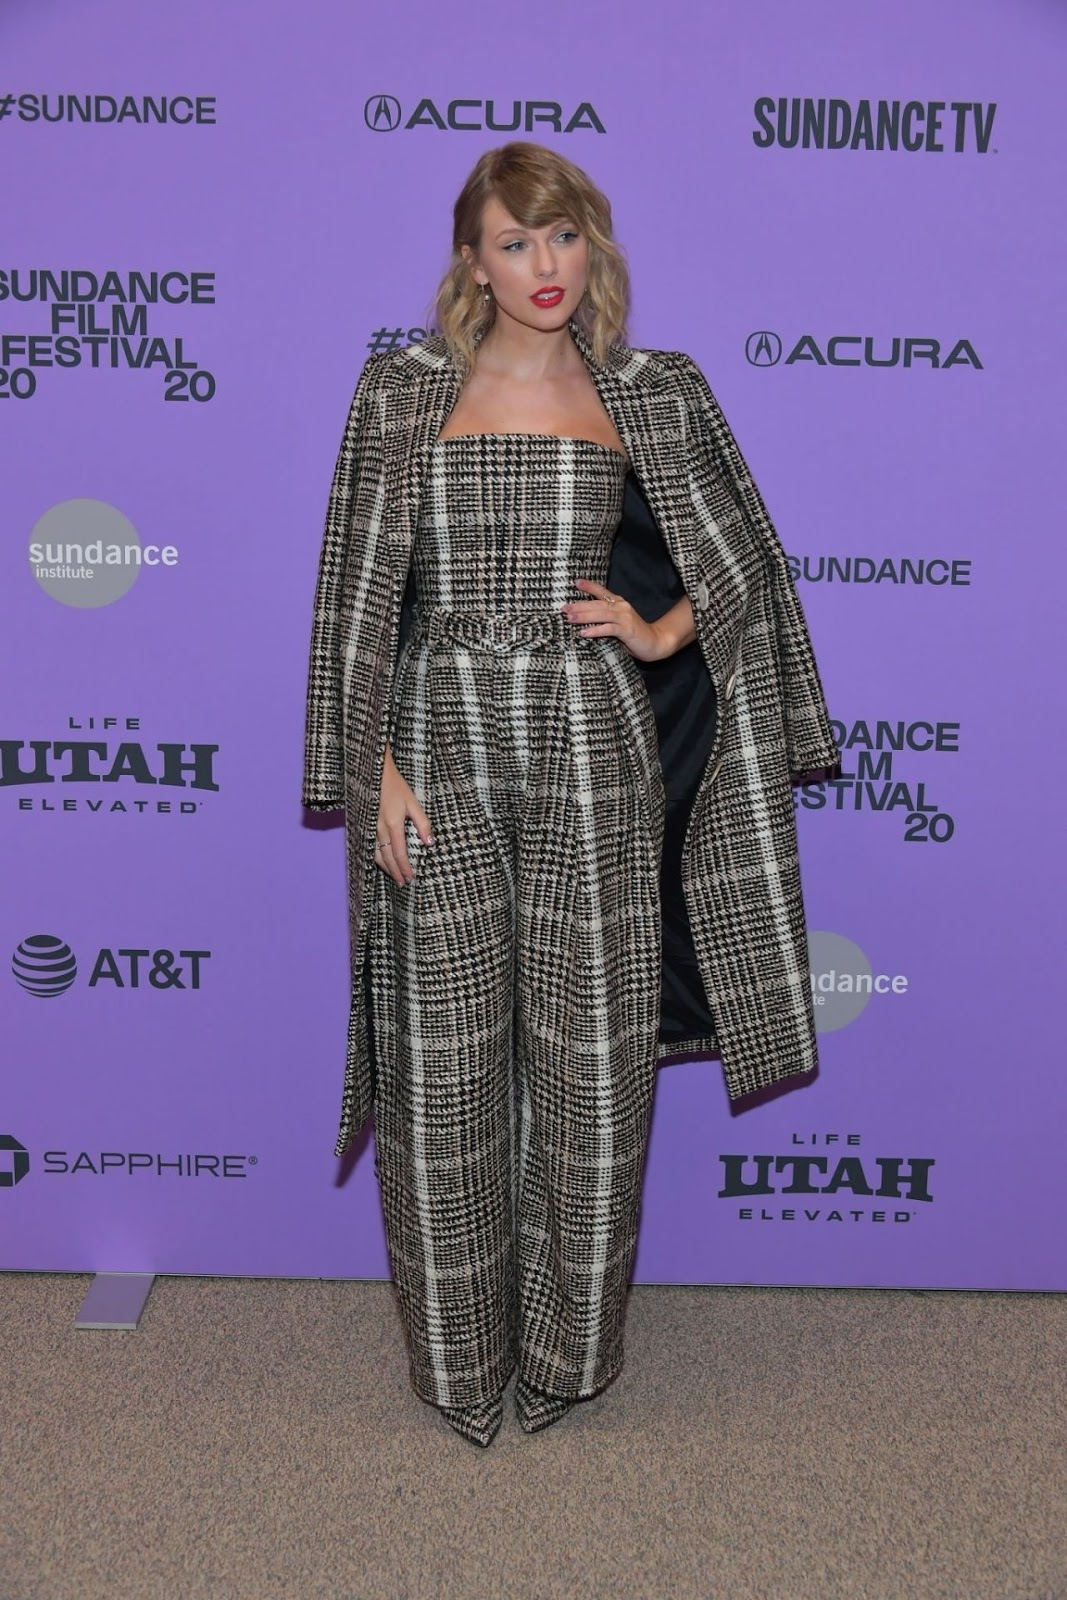 Taylor Swift - Miss Americana Premiere at Sundance Film Festival in Park City